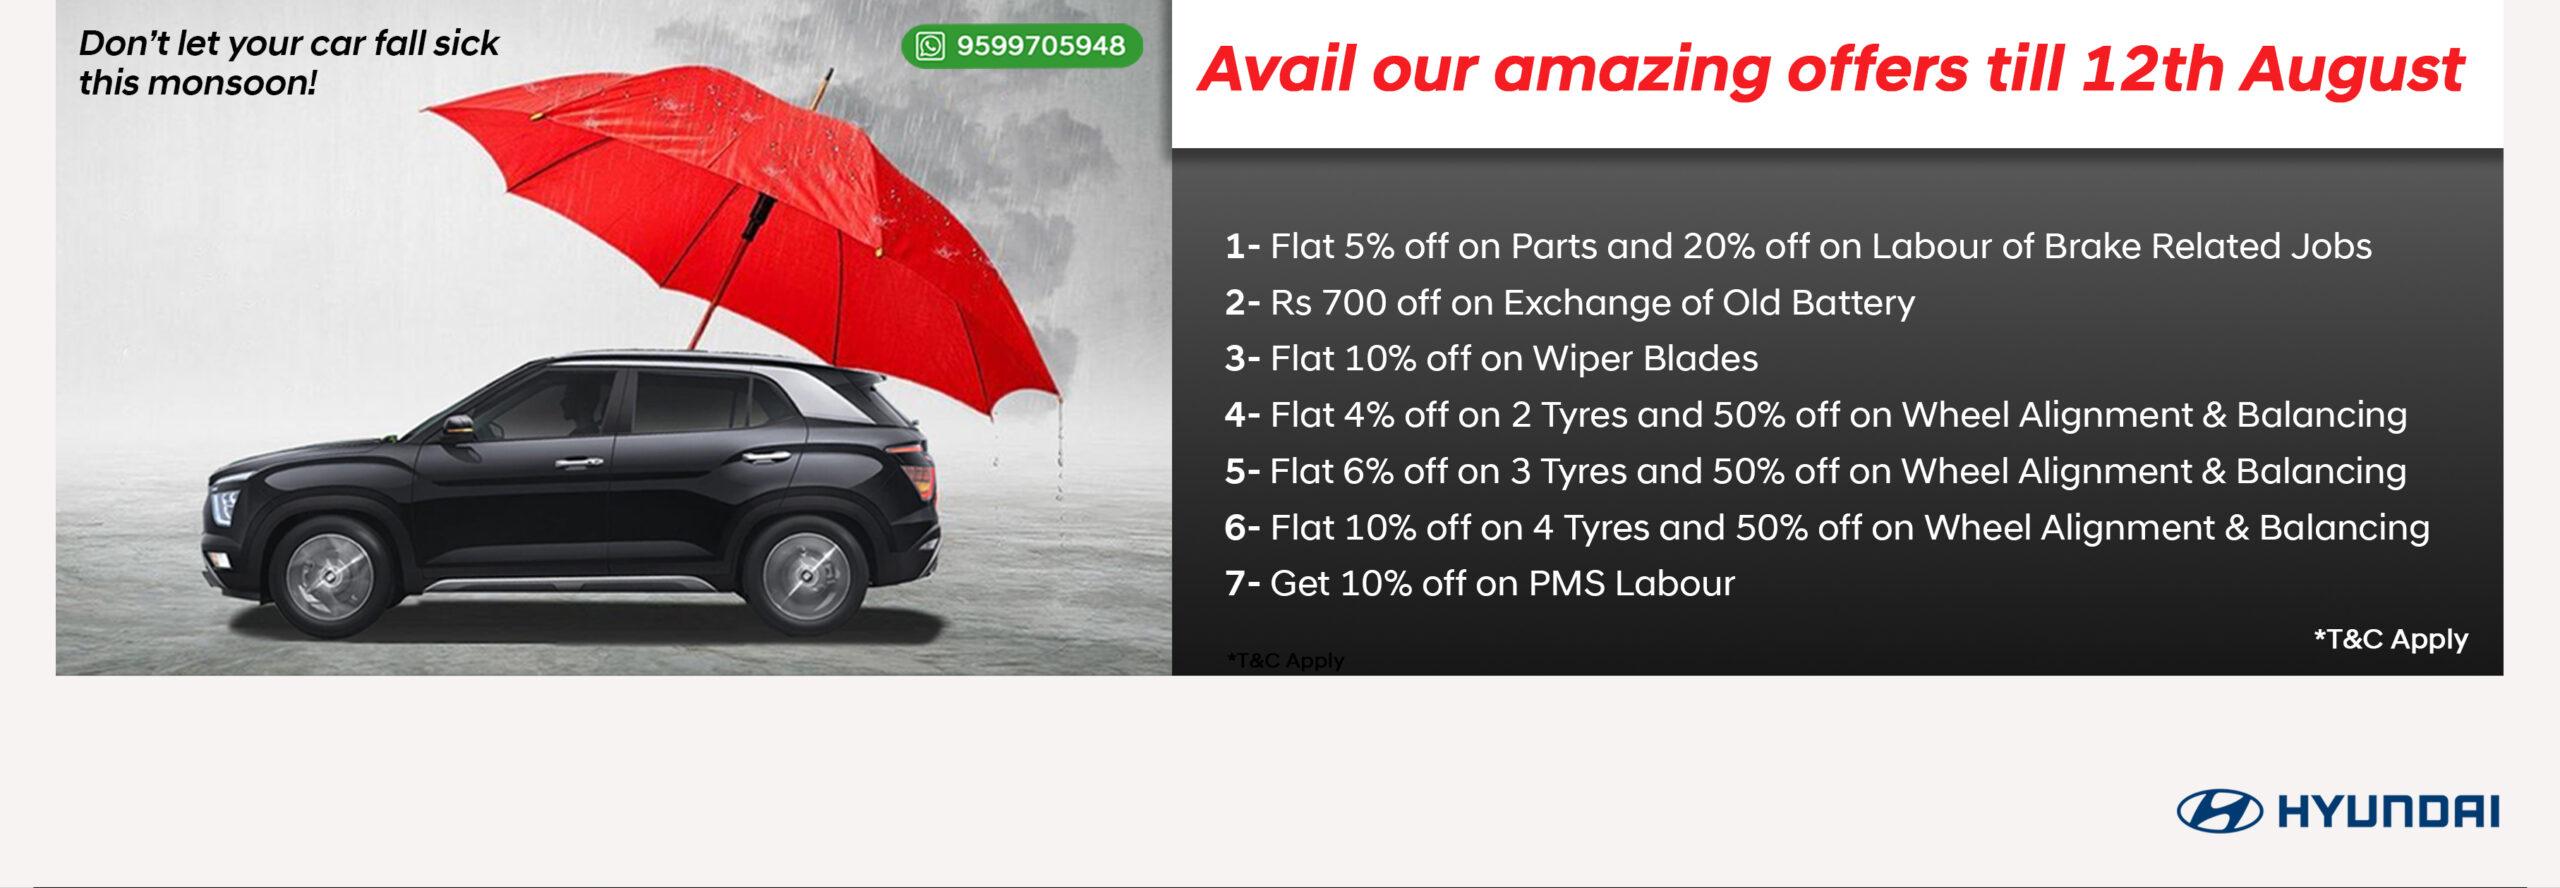 Monsoon Car Service offers